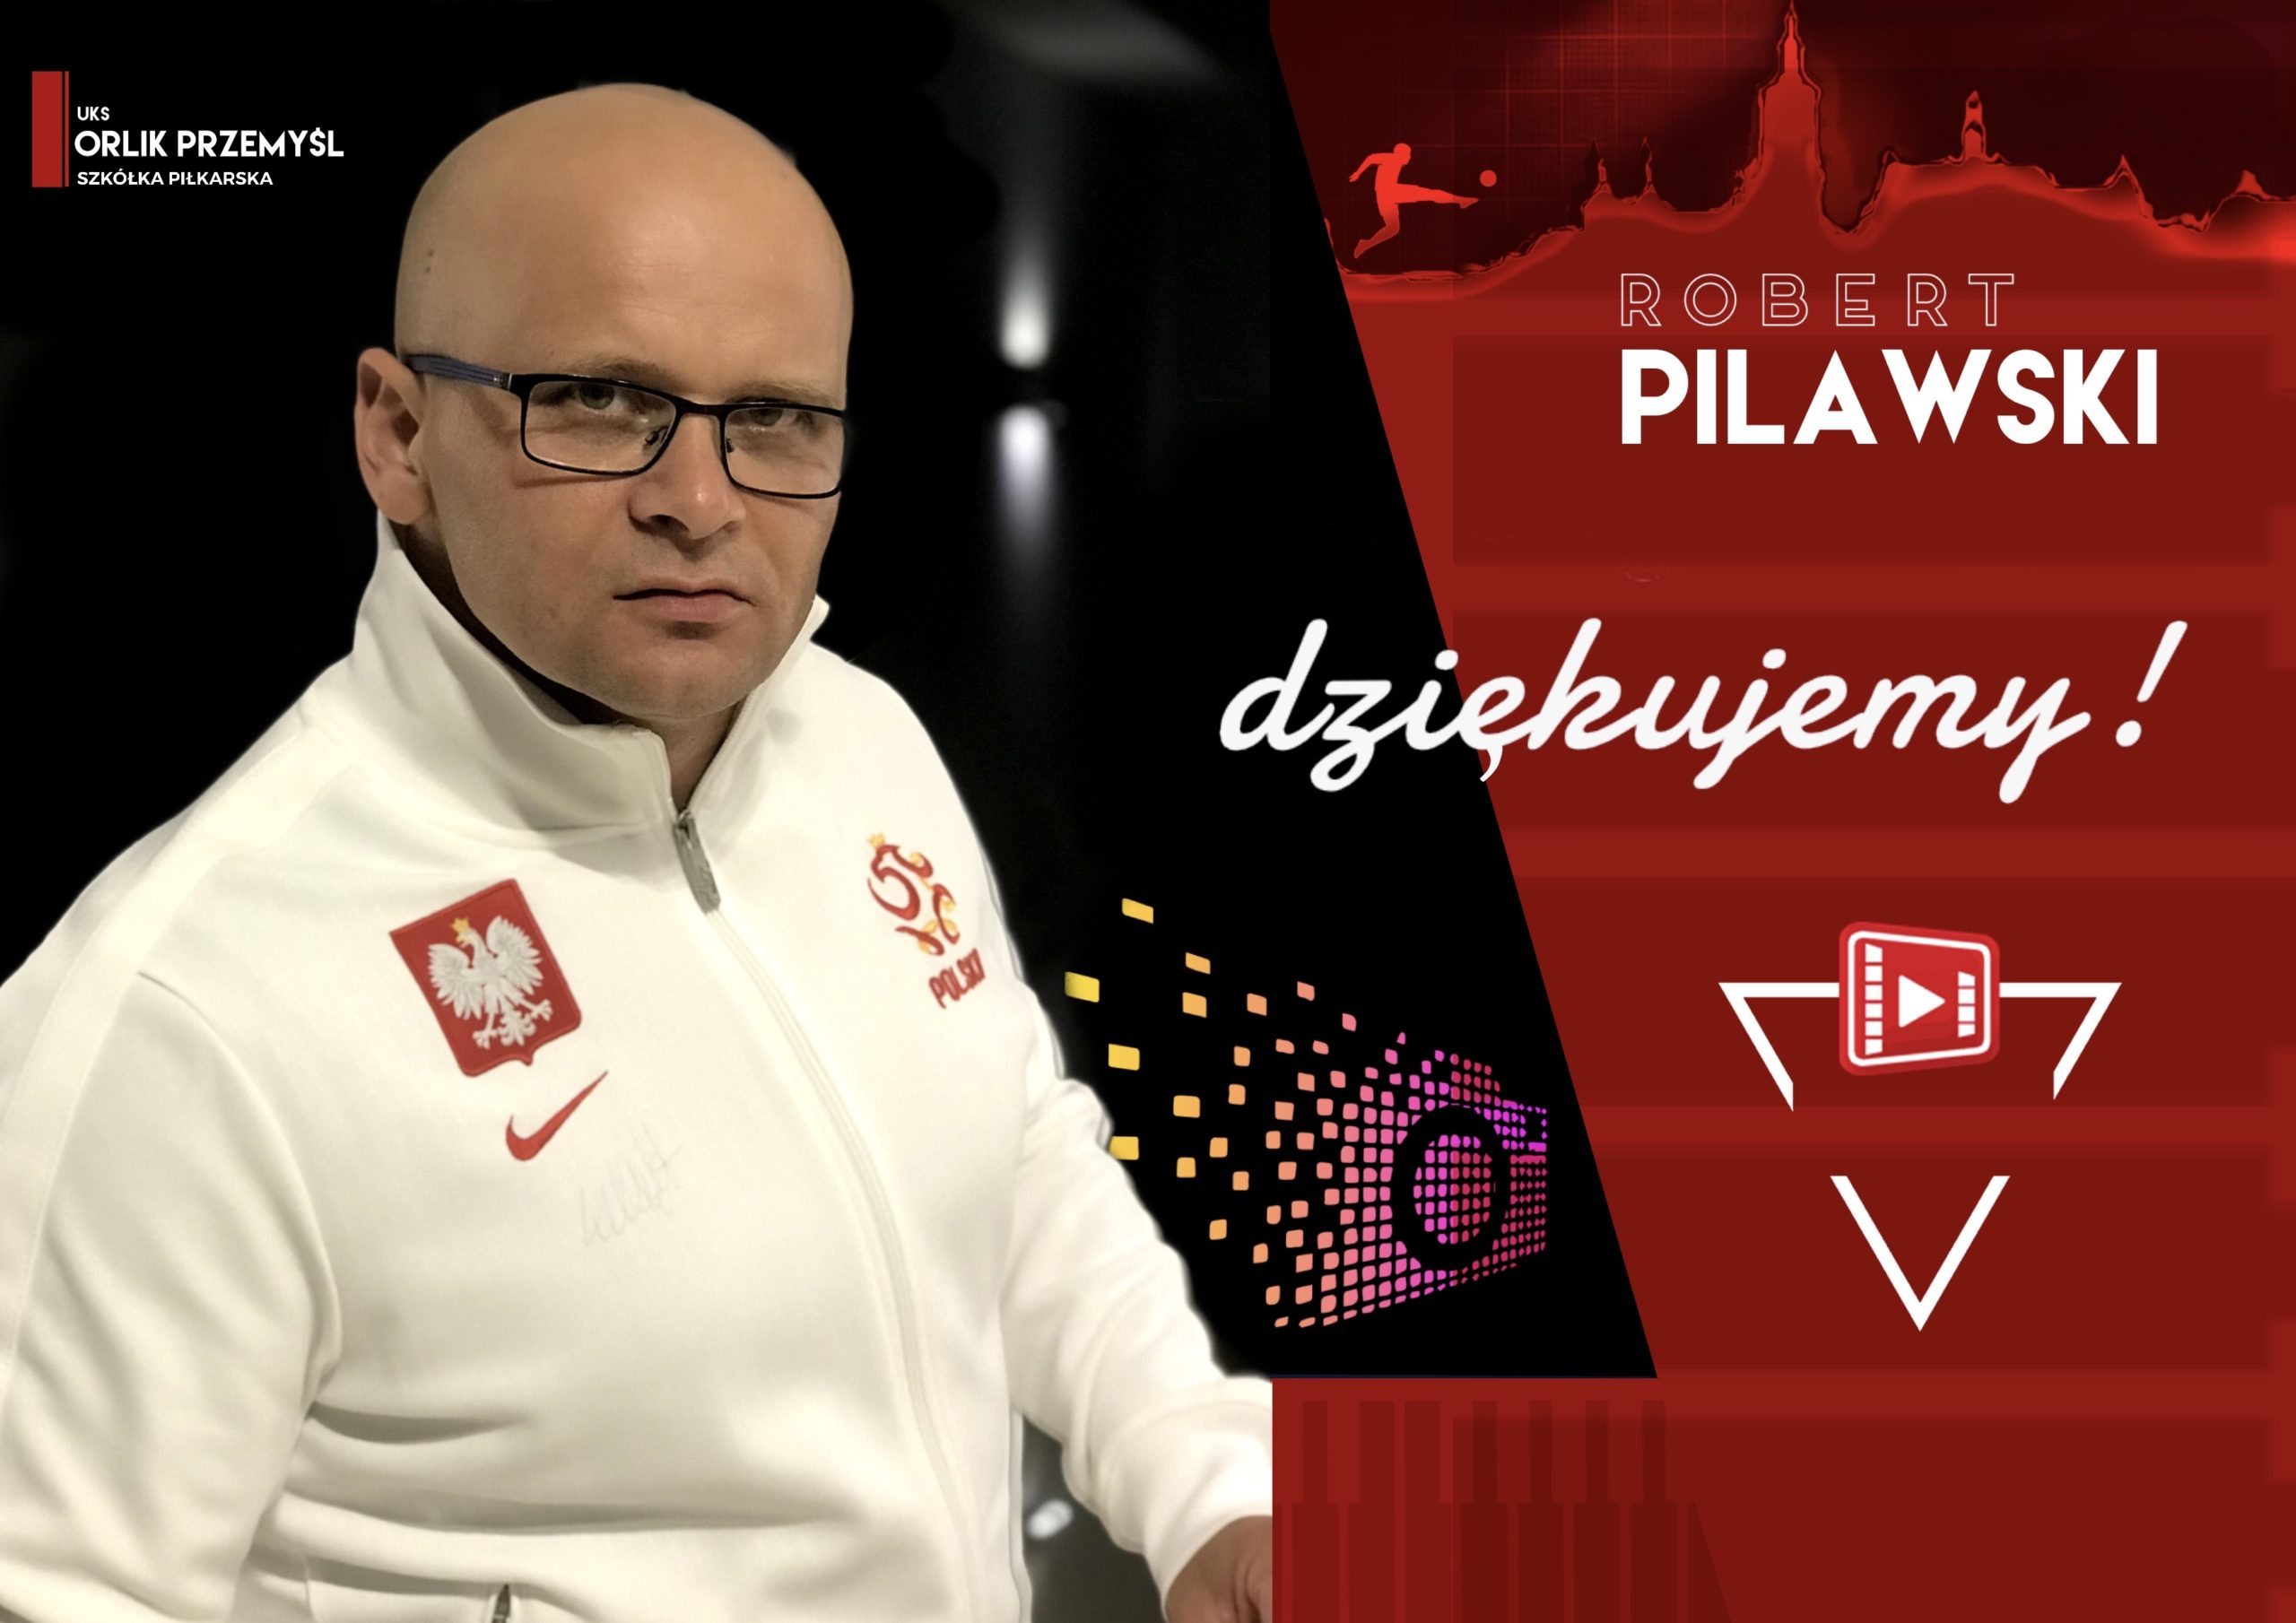 Robert Pilawski